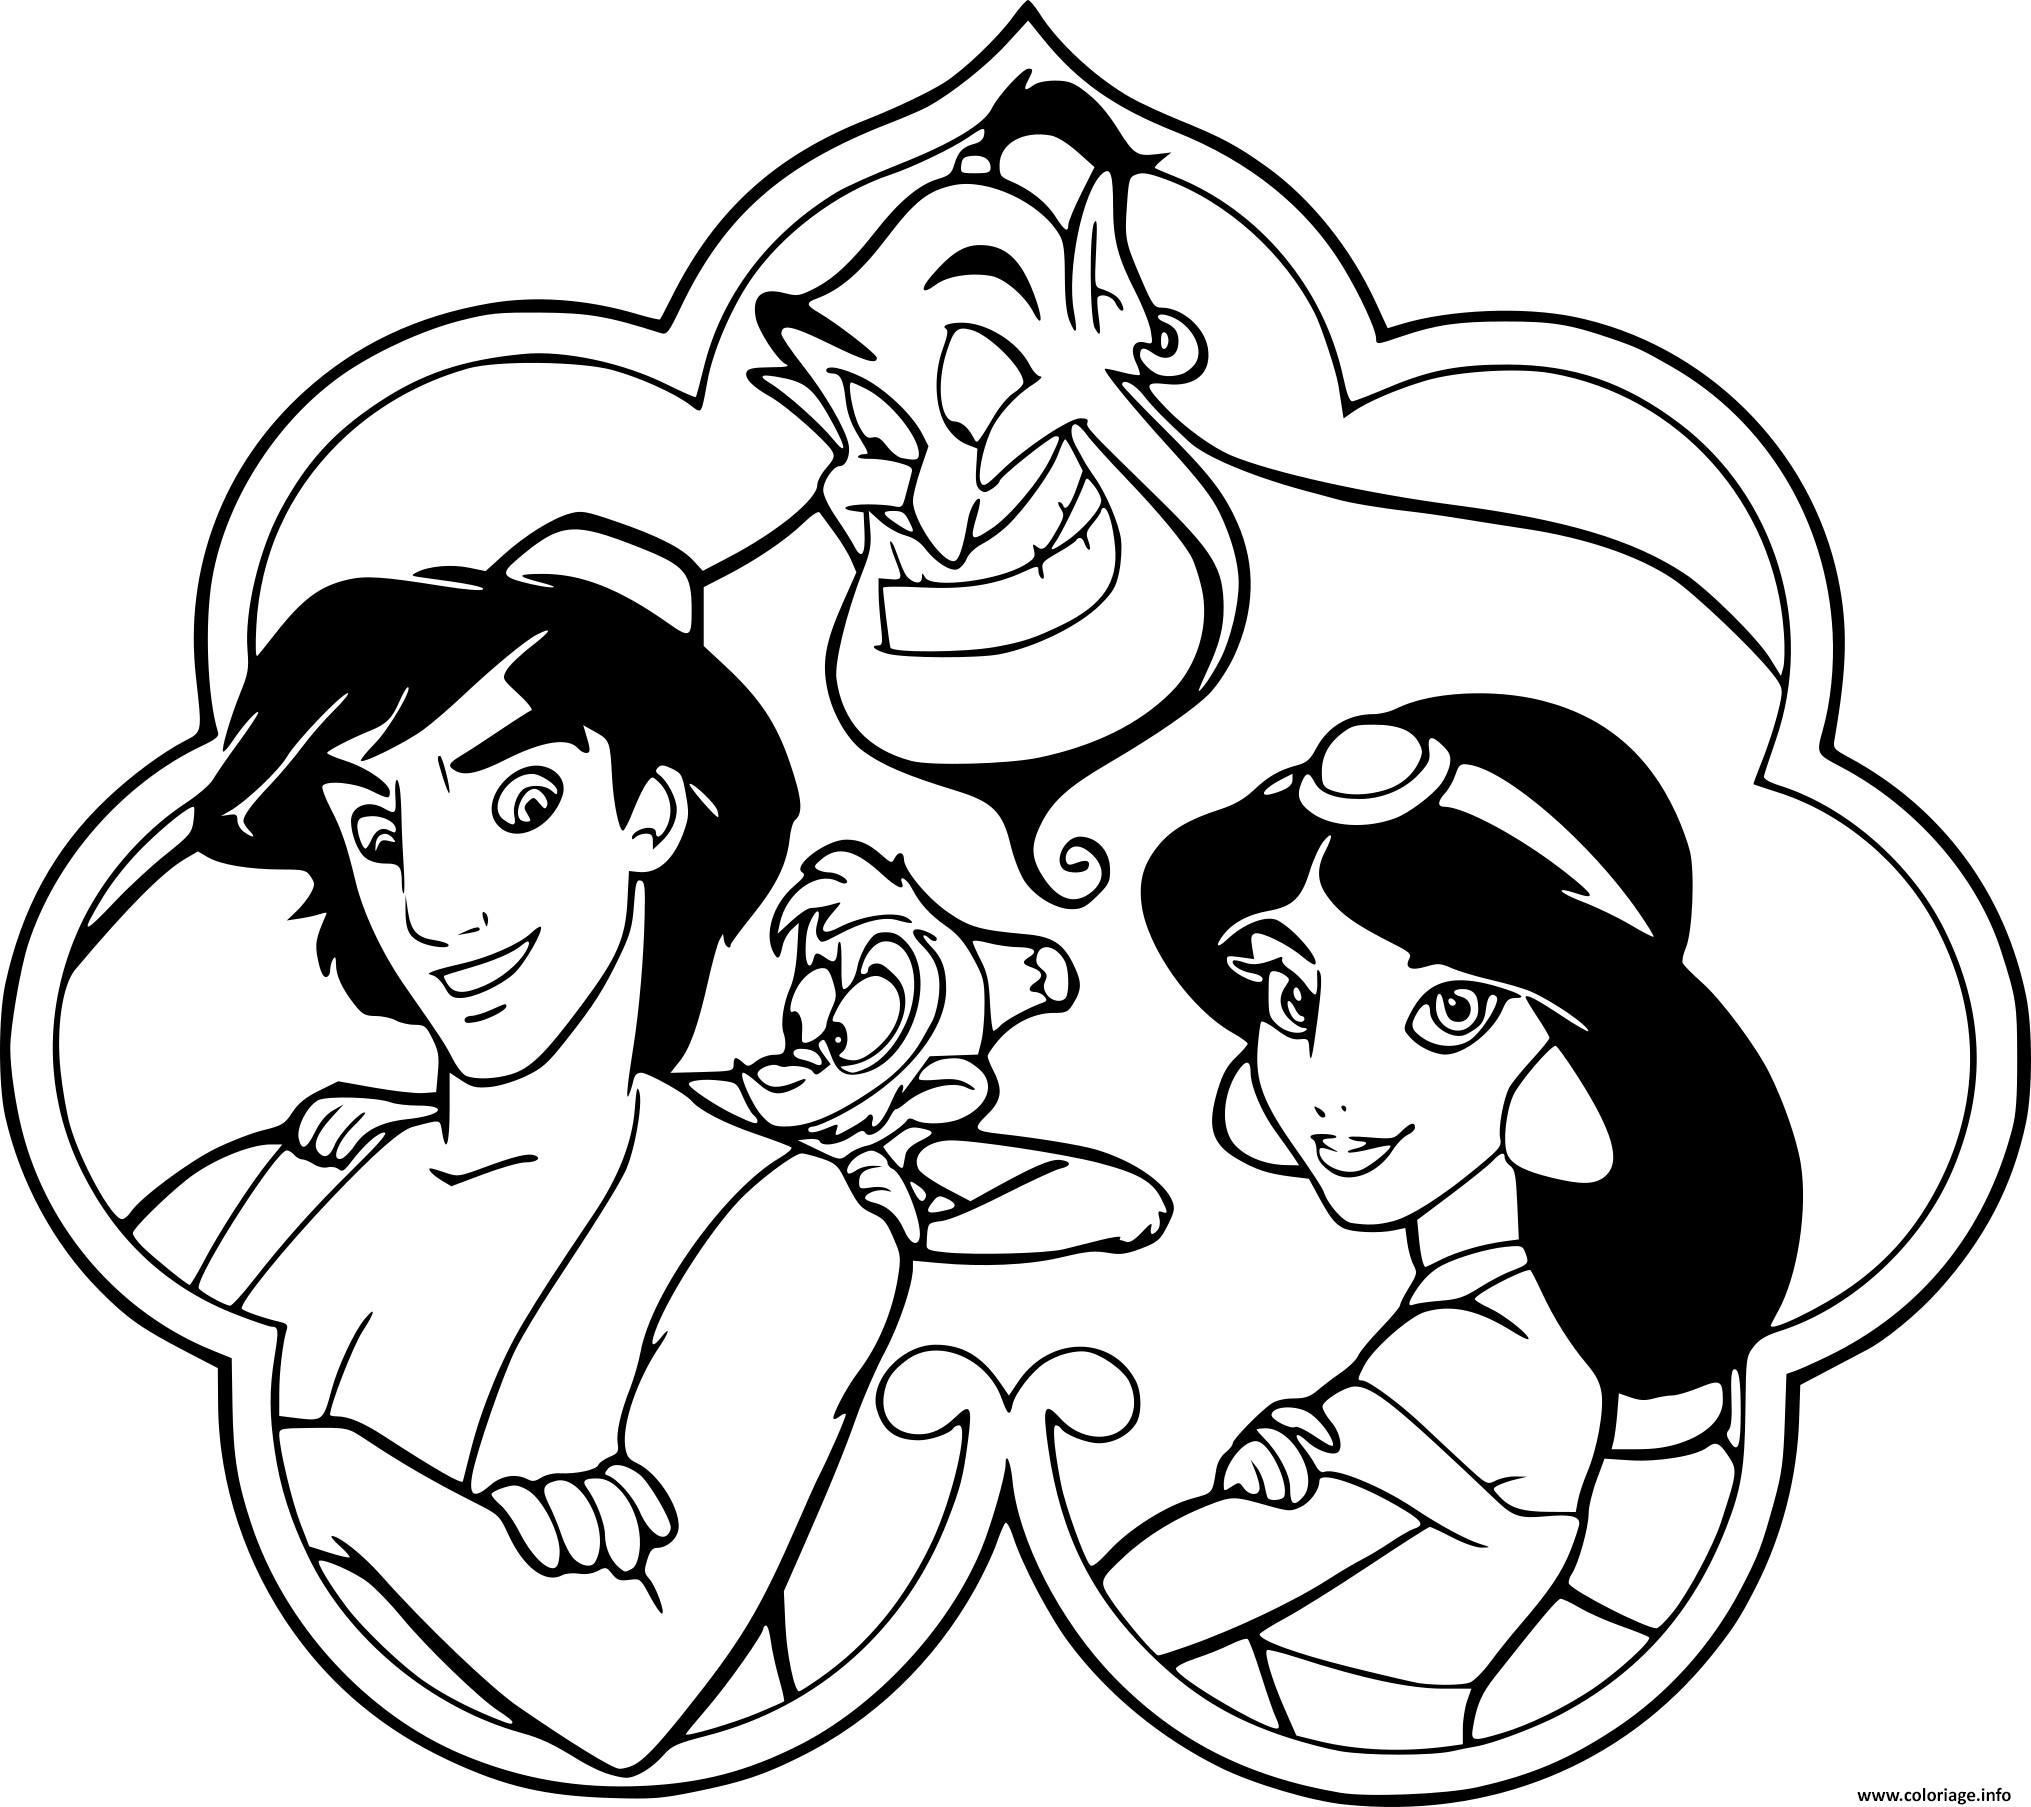 Coloriage aladdin jasmine genie abu dessin - Dessin a imprimer aladin ...